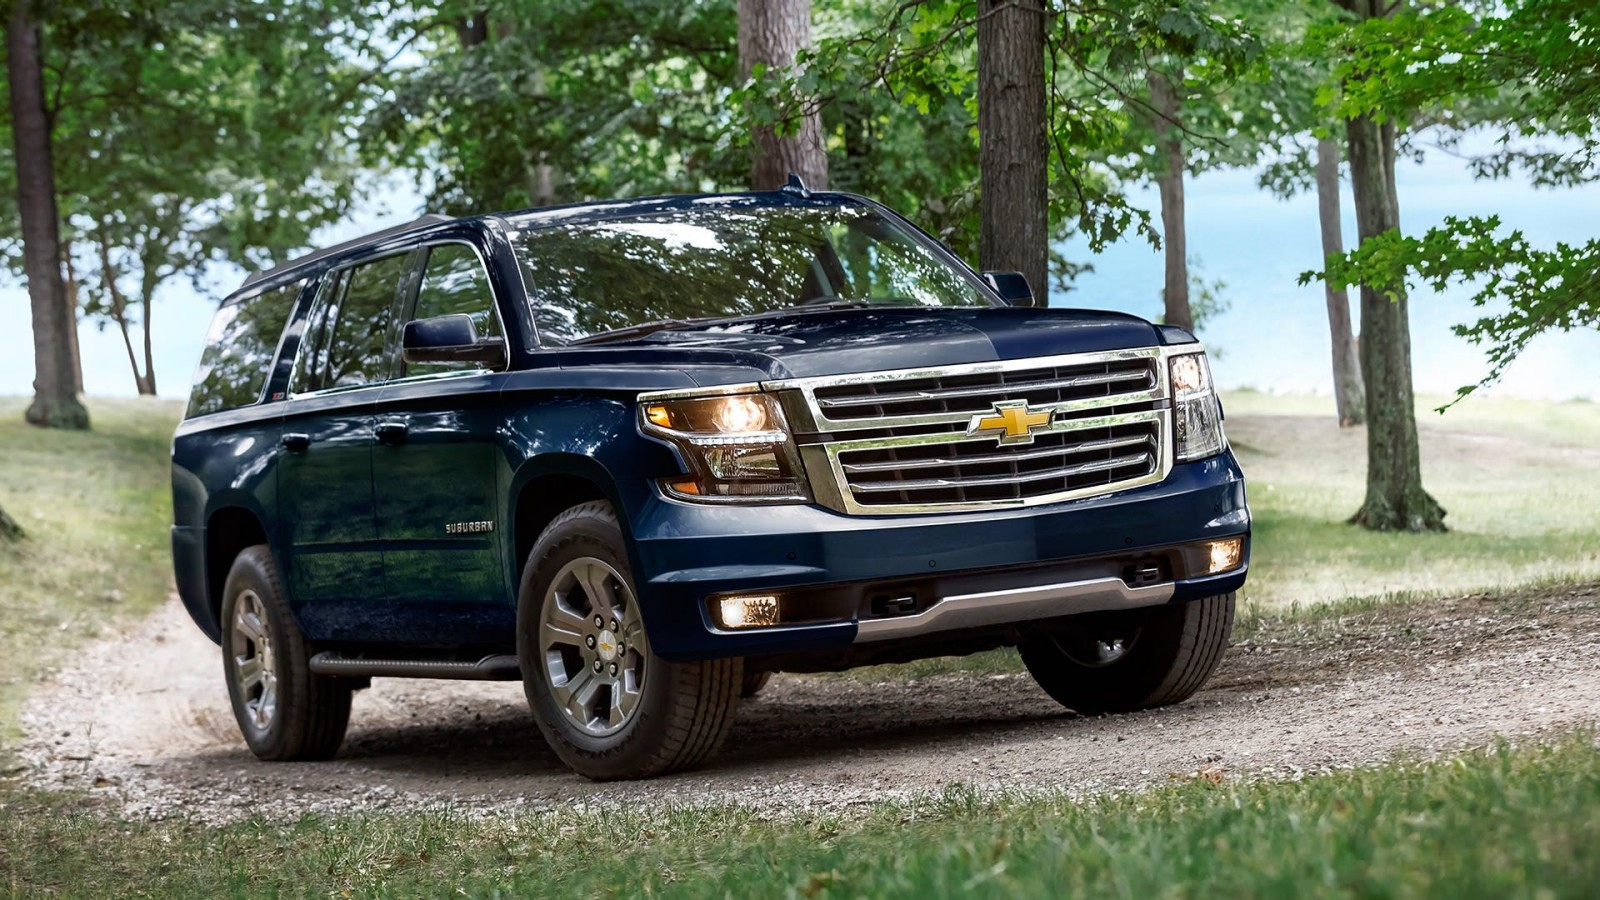 Suburban 2015 chevy suburban mpg : New Chevrolet Suburban Lease and Finance Offers - Richmond, KY